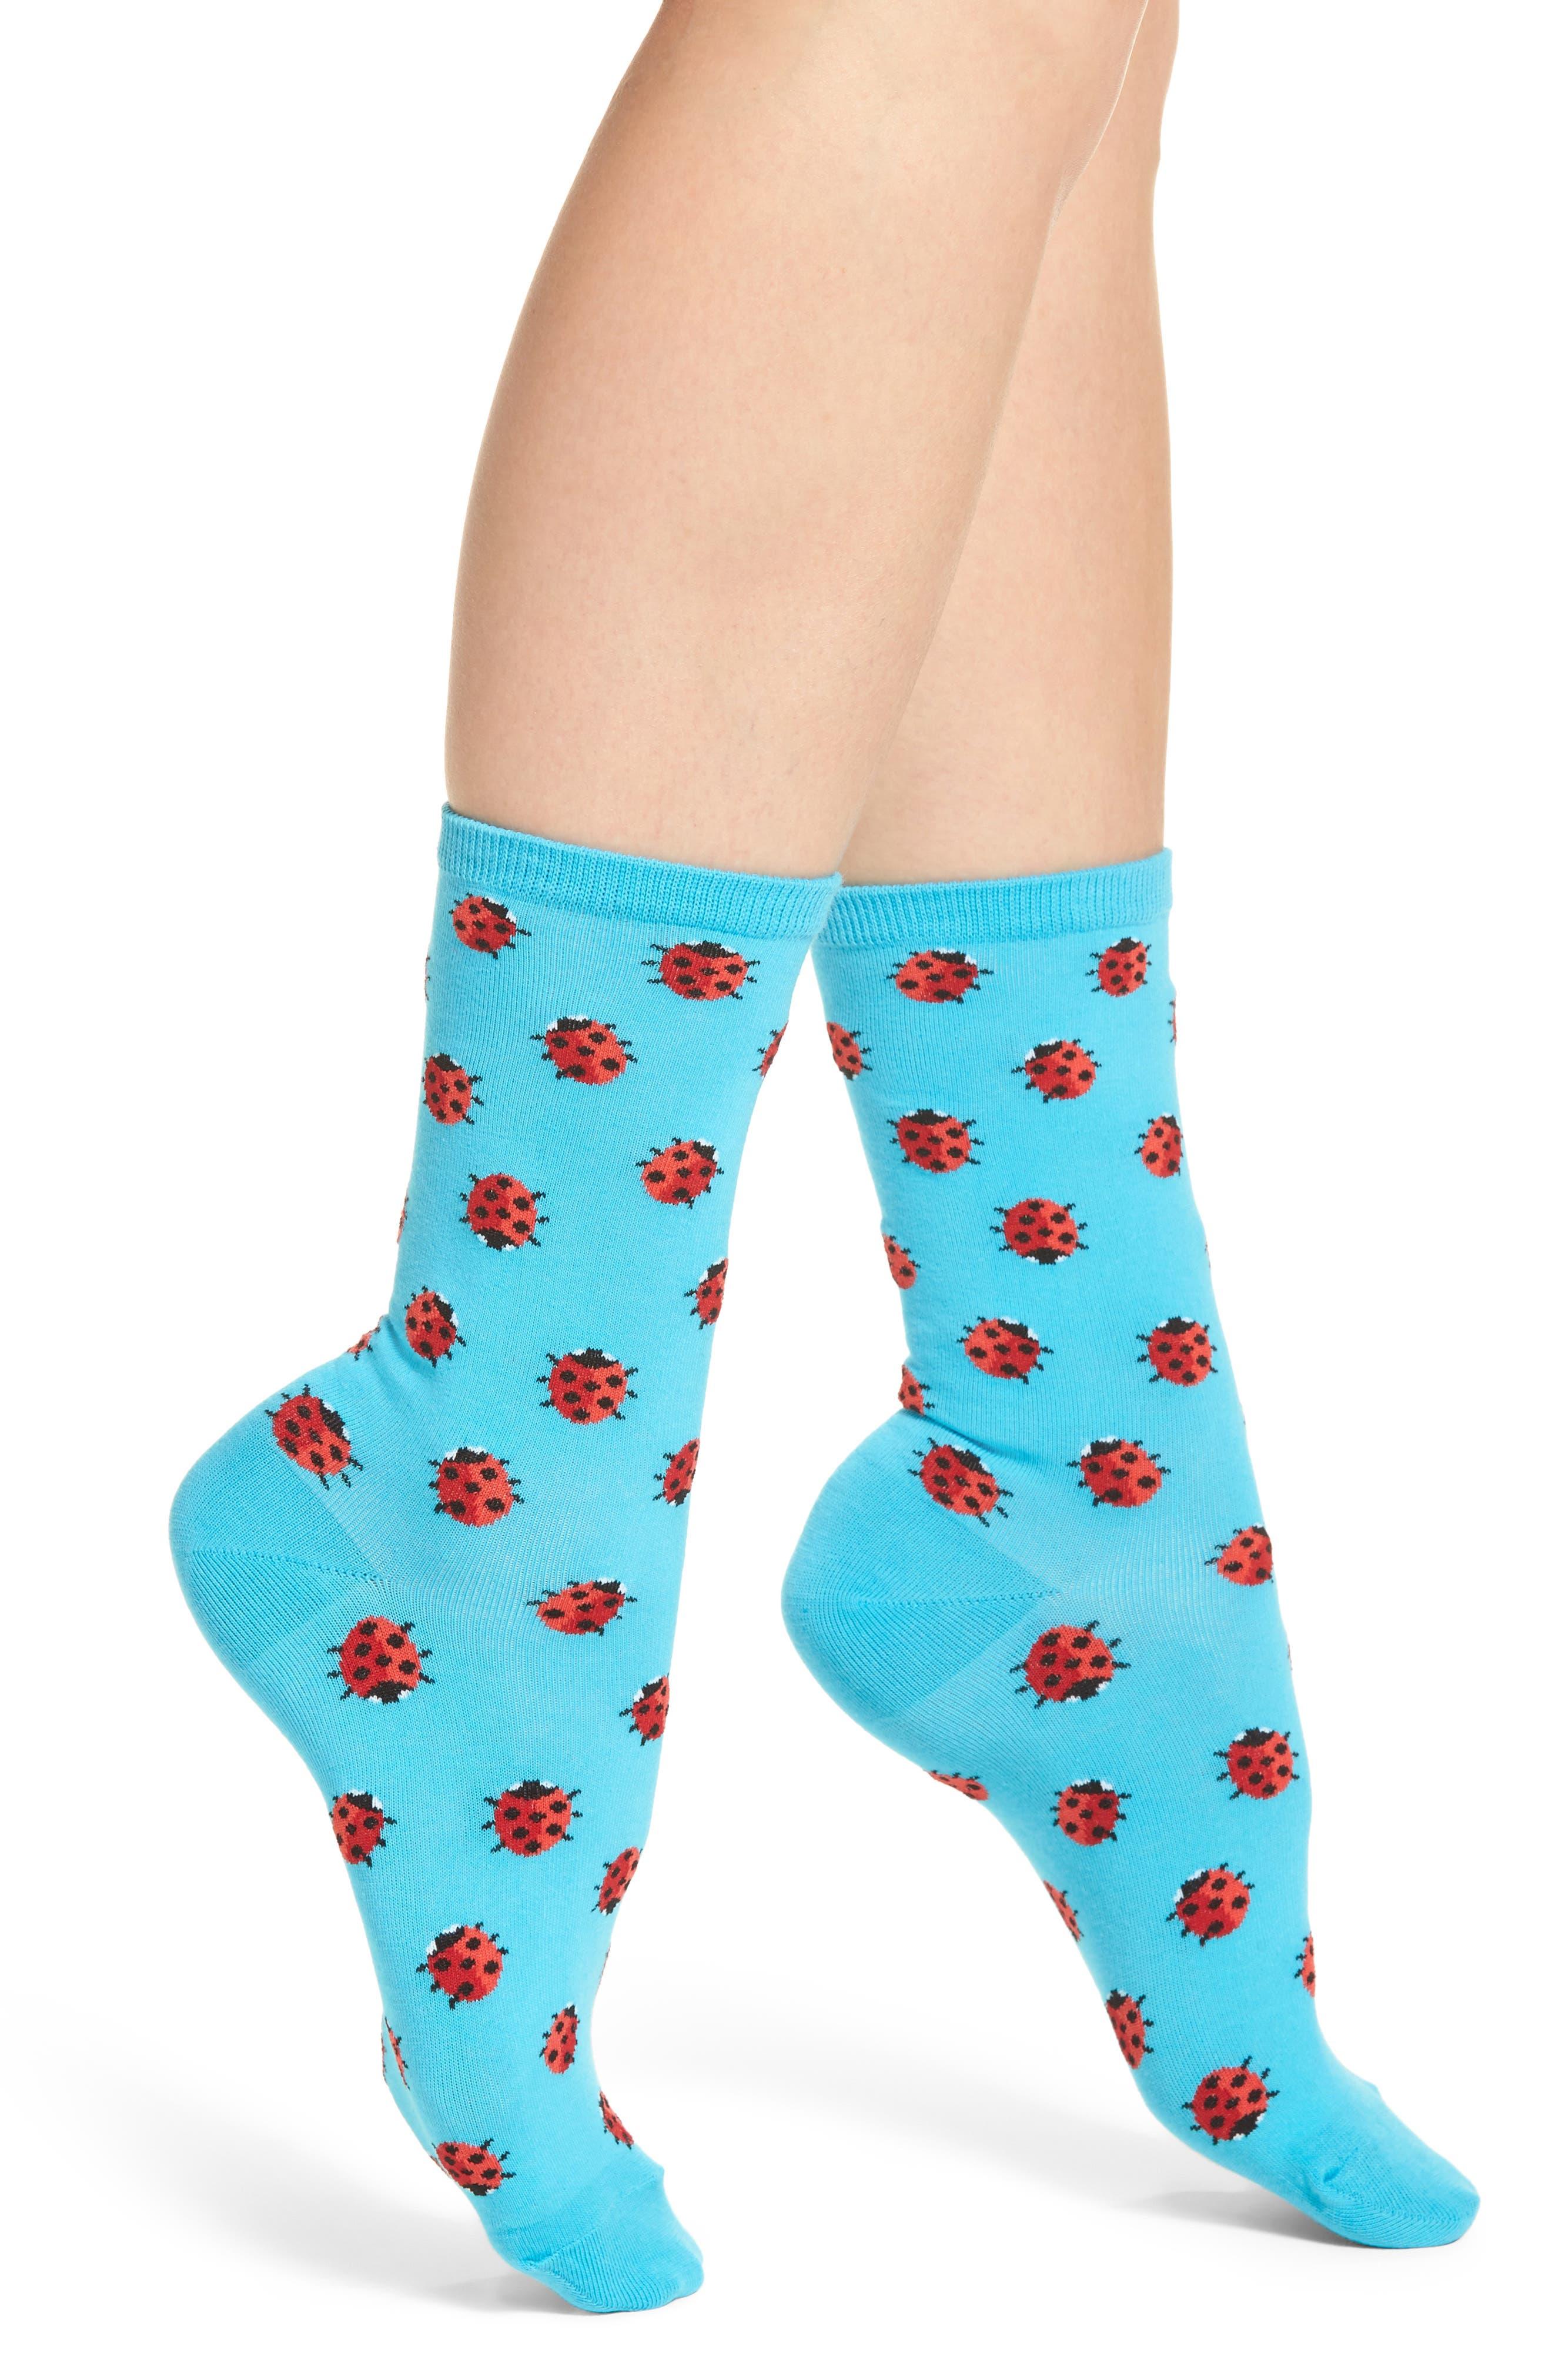 Ladybug Crew Socks,                         Main,                         color, Light Blue